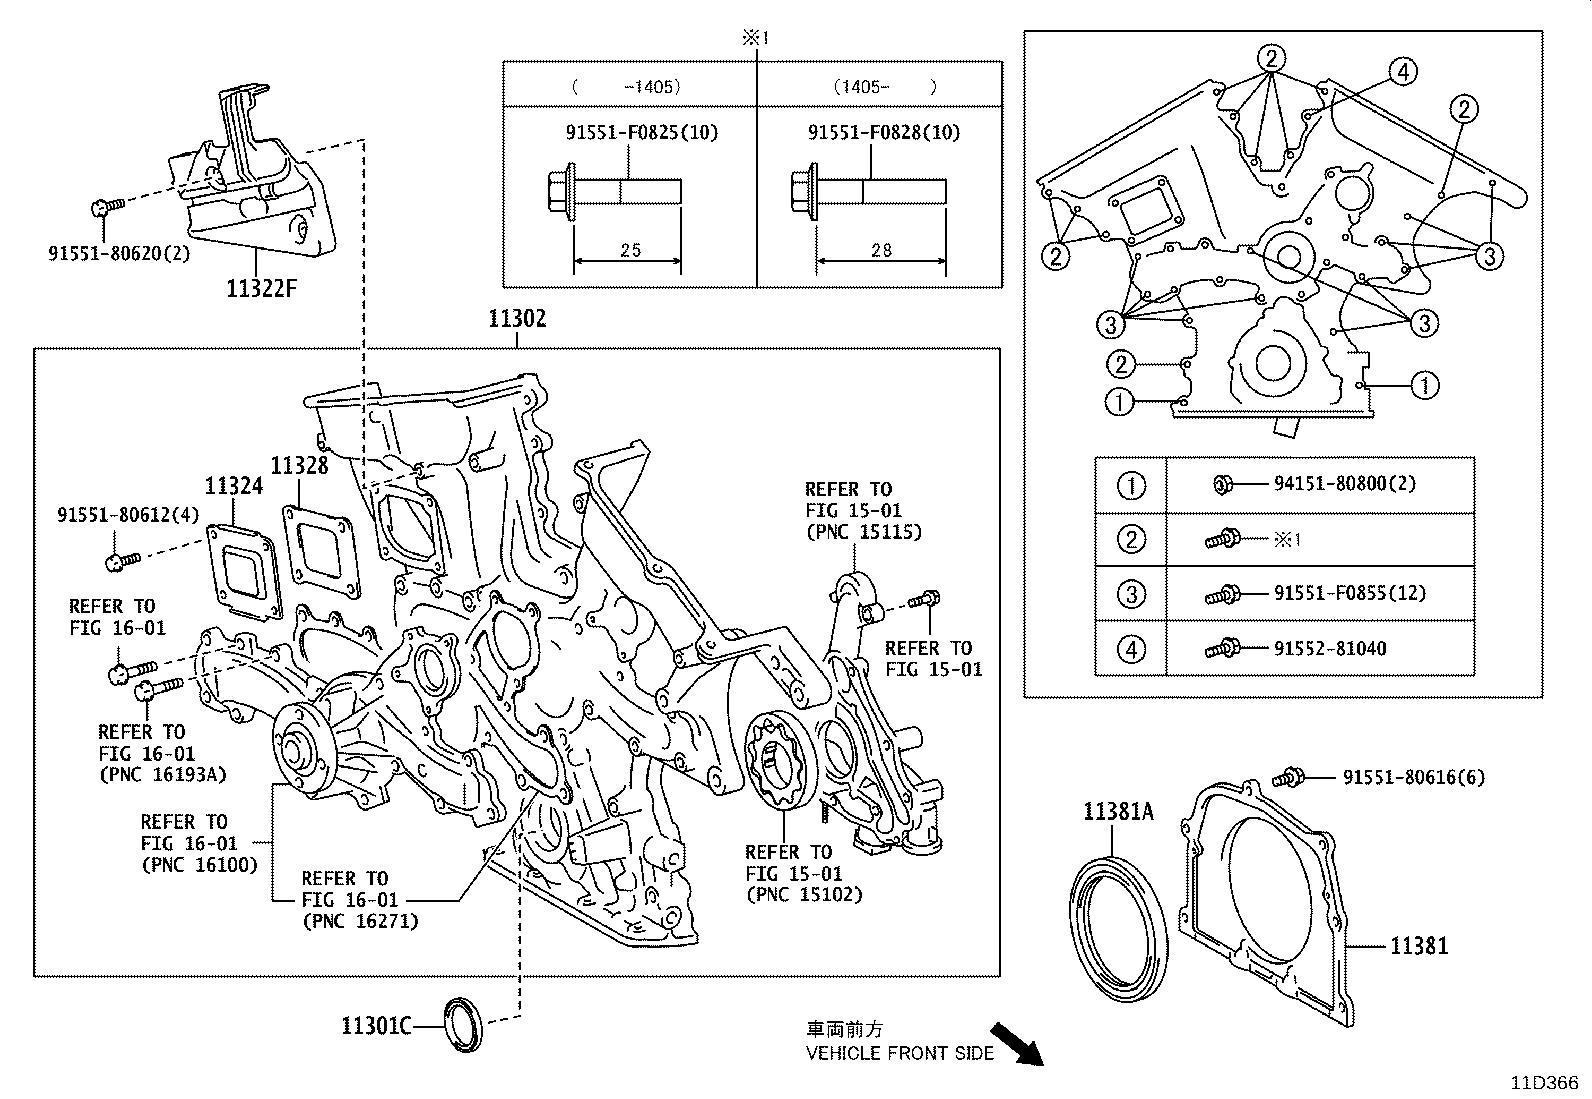 Lexus RX 350 Engine Crankshaft Seal (Rear). Seal, Type T